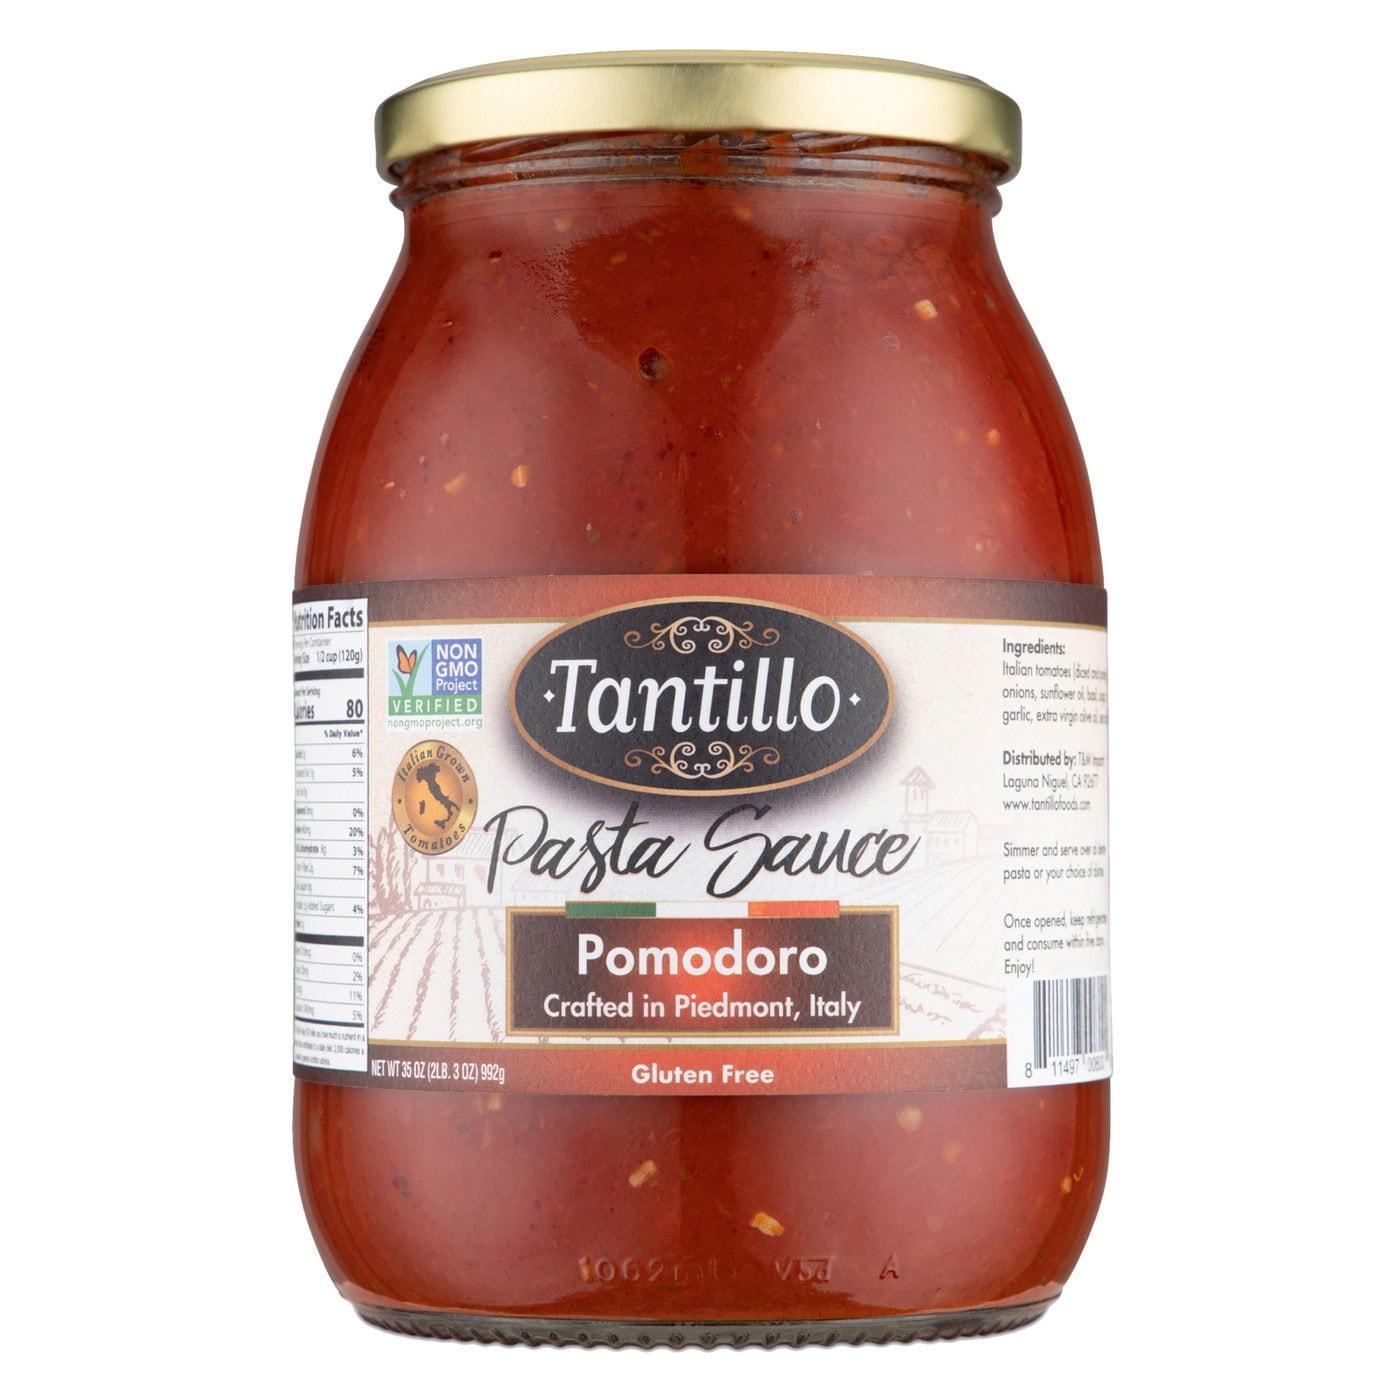 Tantillo Imported Italian Pomodoro Pasta Sauce 35oz (Pack of 2)